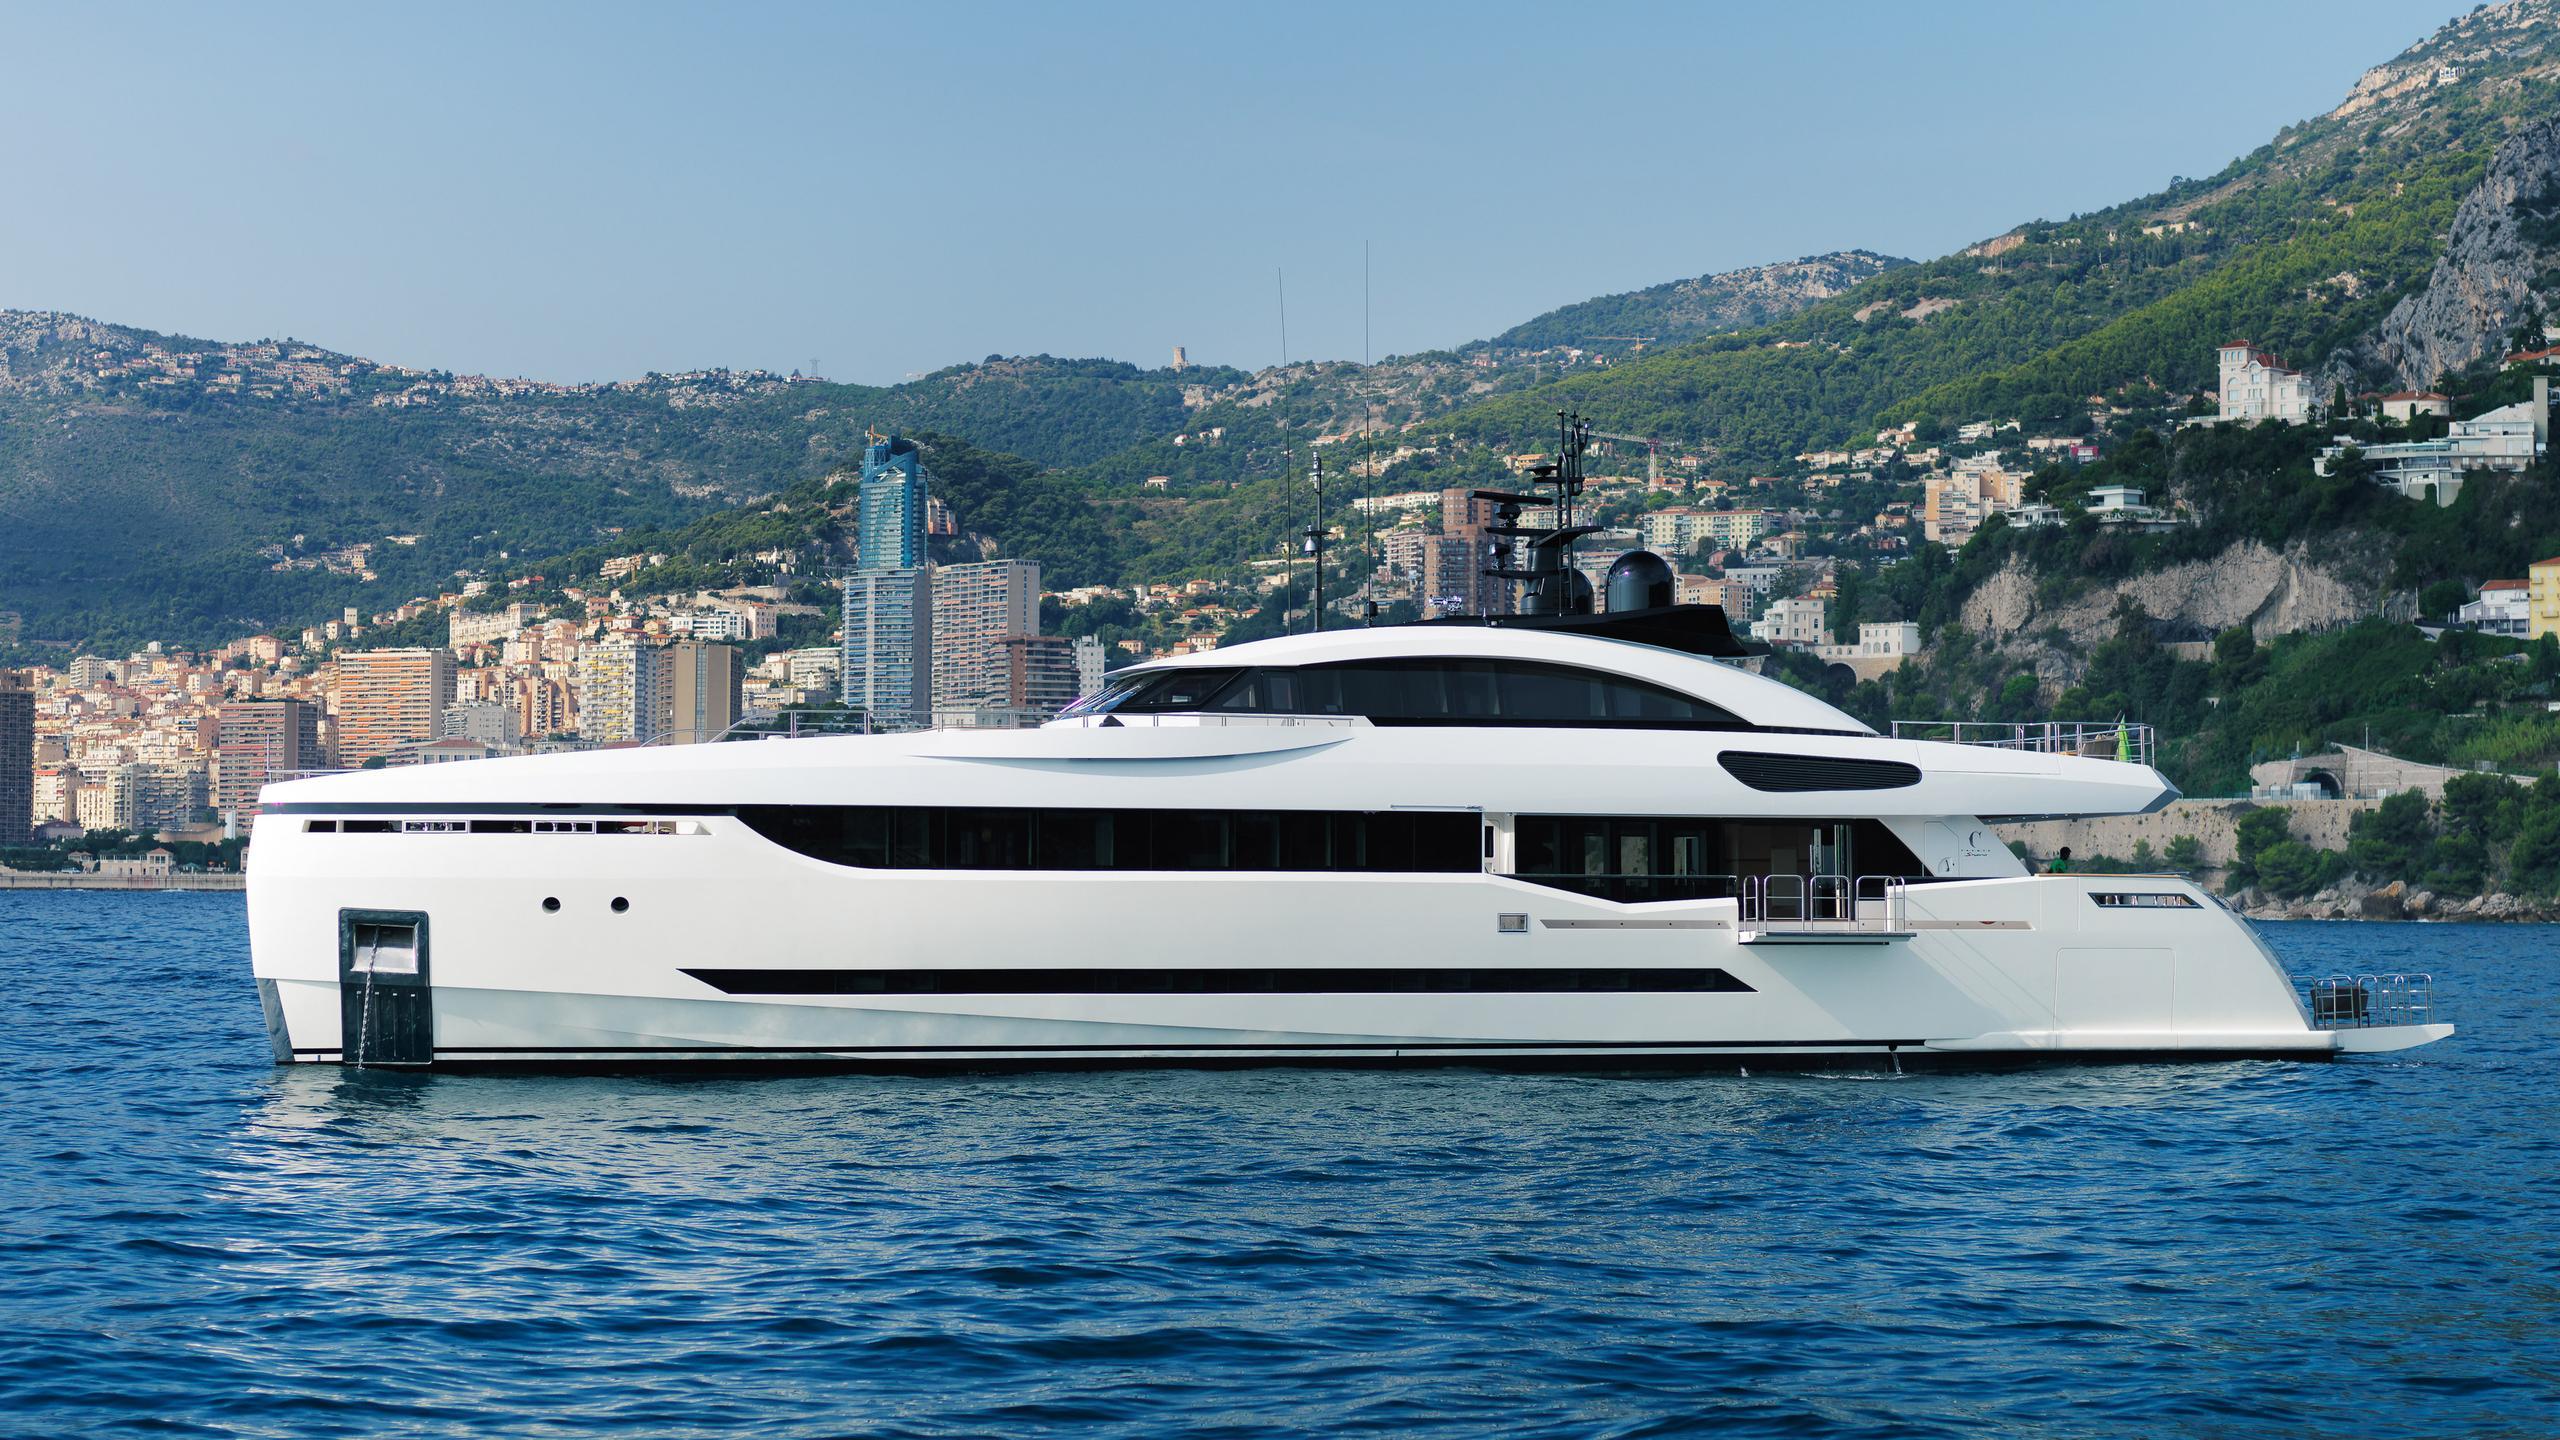 k-divine-motor-yacht-palumbo-40s-2015-40m-profile